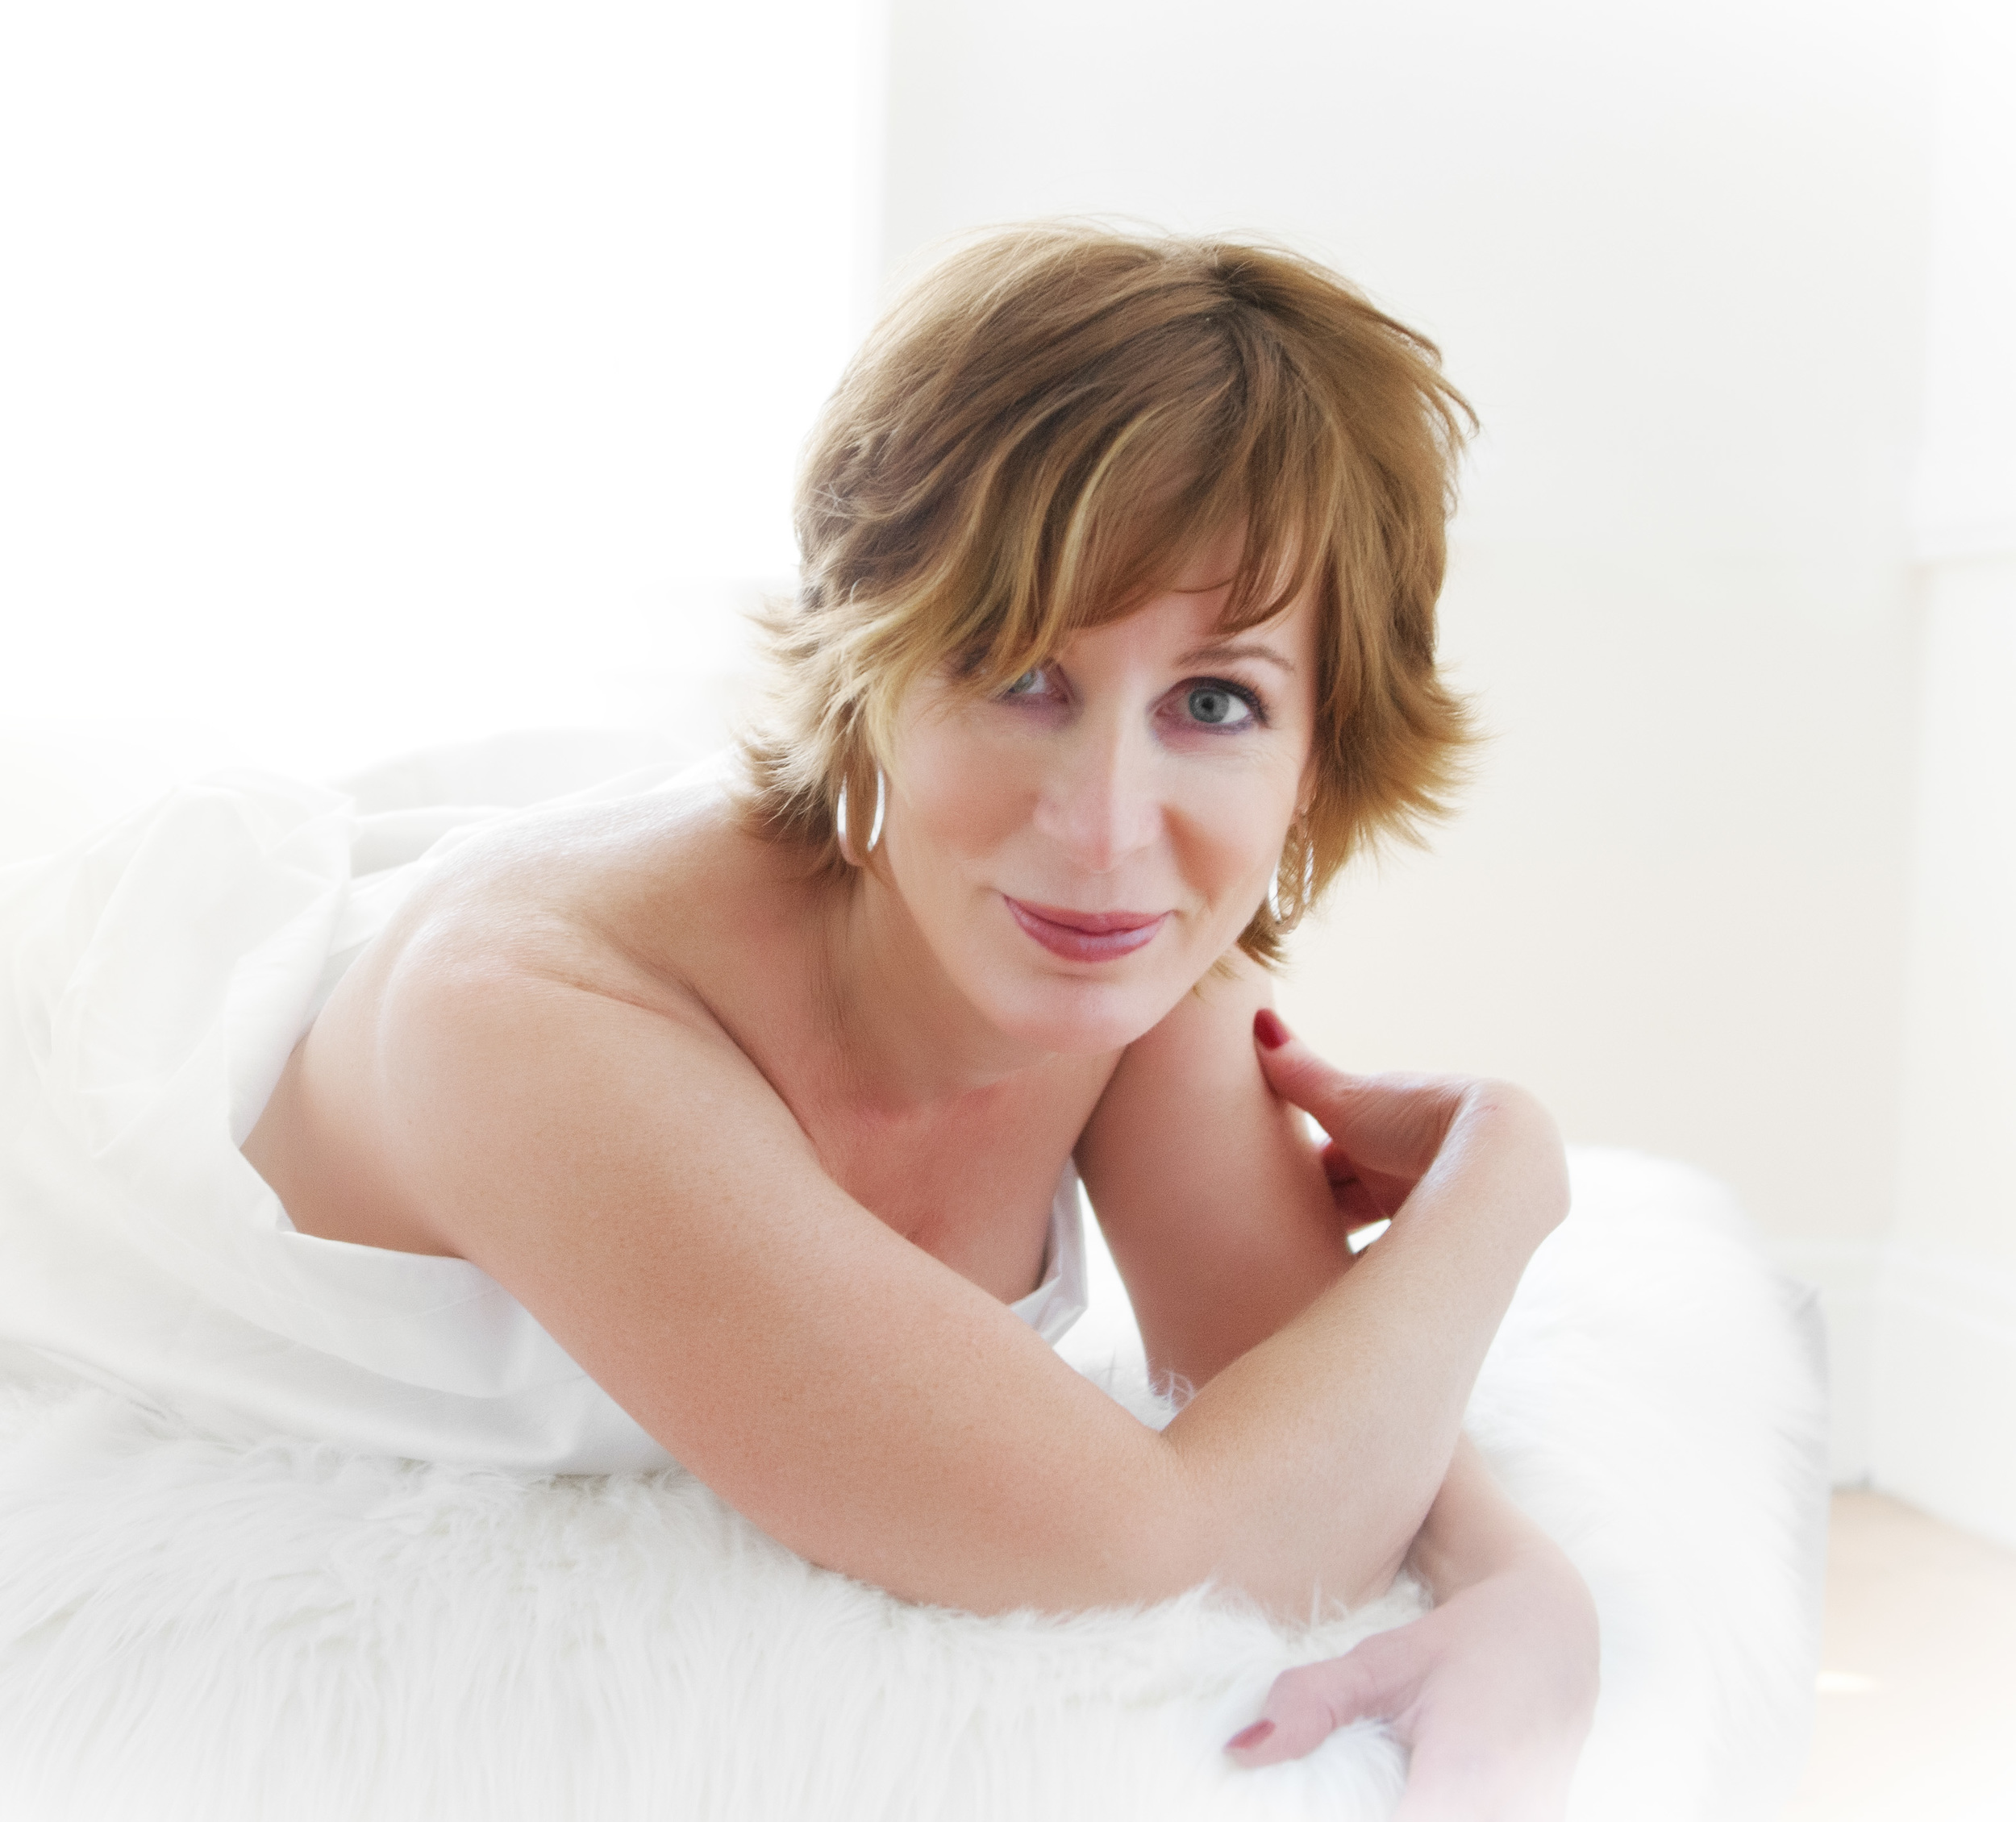 Portrait Photography Beuty Bridgett Thompson Sandra -2014 -.jpg